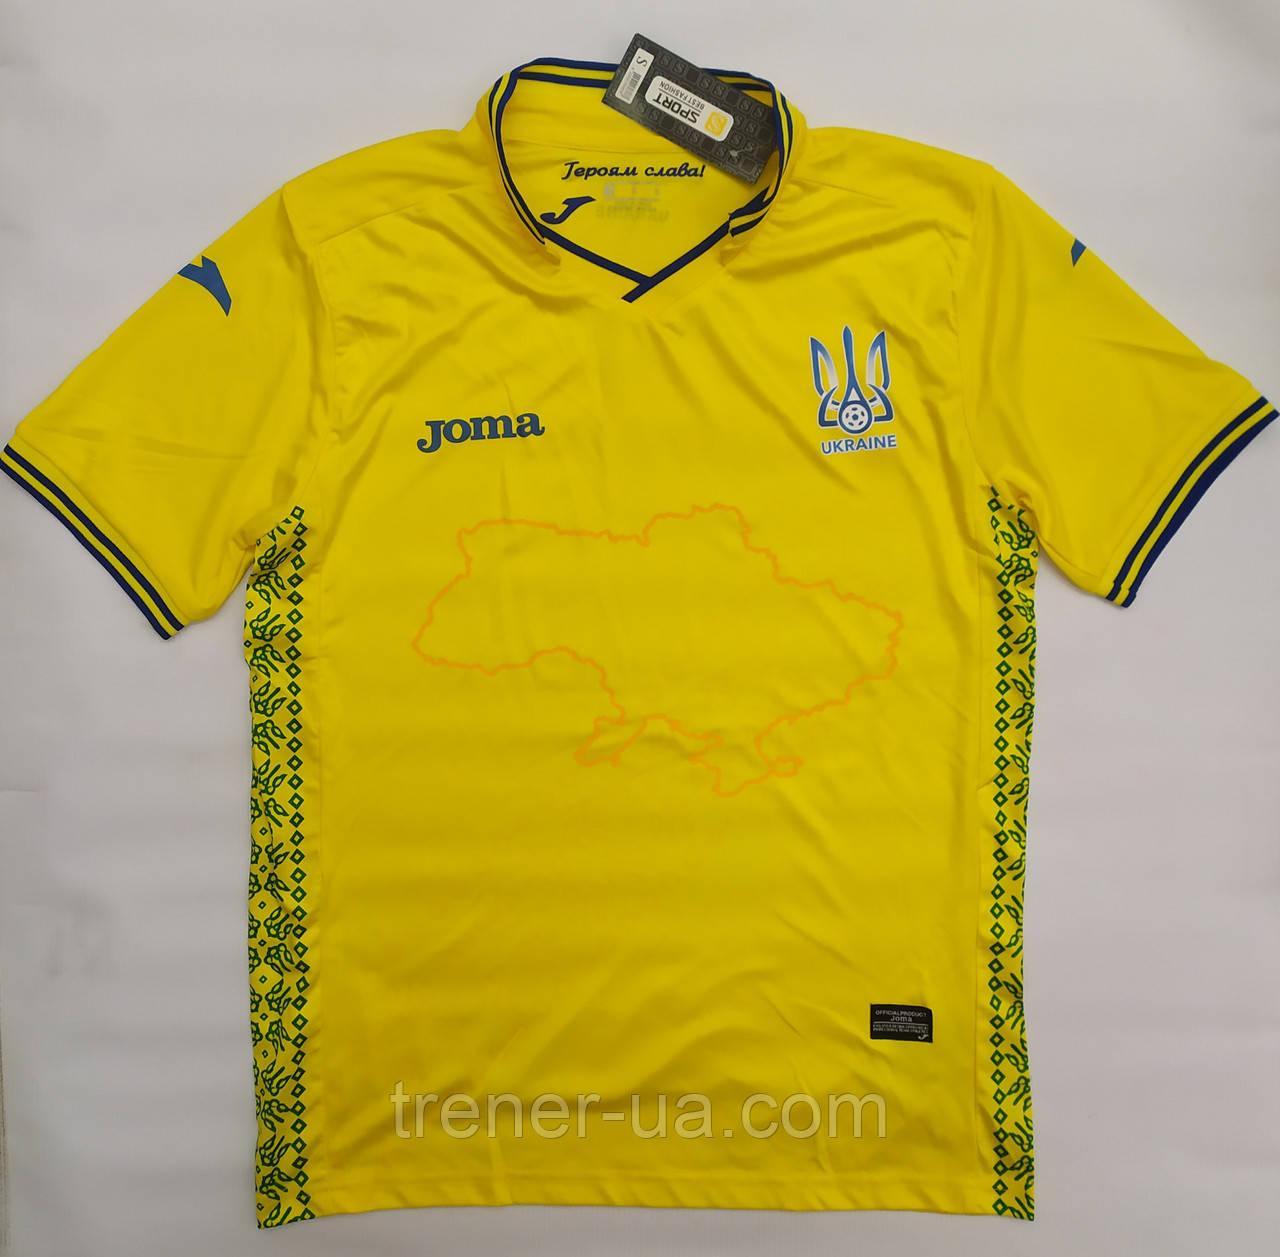 Футболка Збірної України 2021/футболка жовта Слава Україні Героям Слава/футболка Україна жовта Євро 2021/